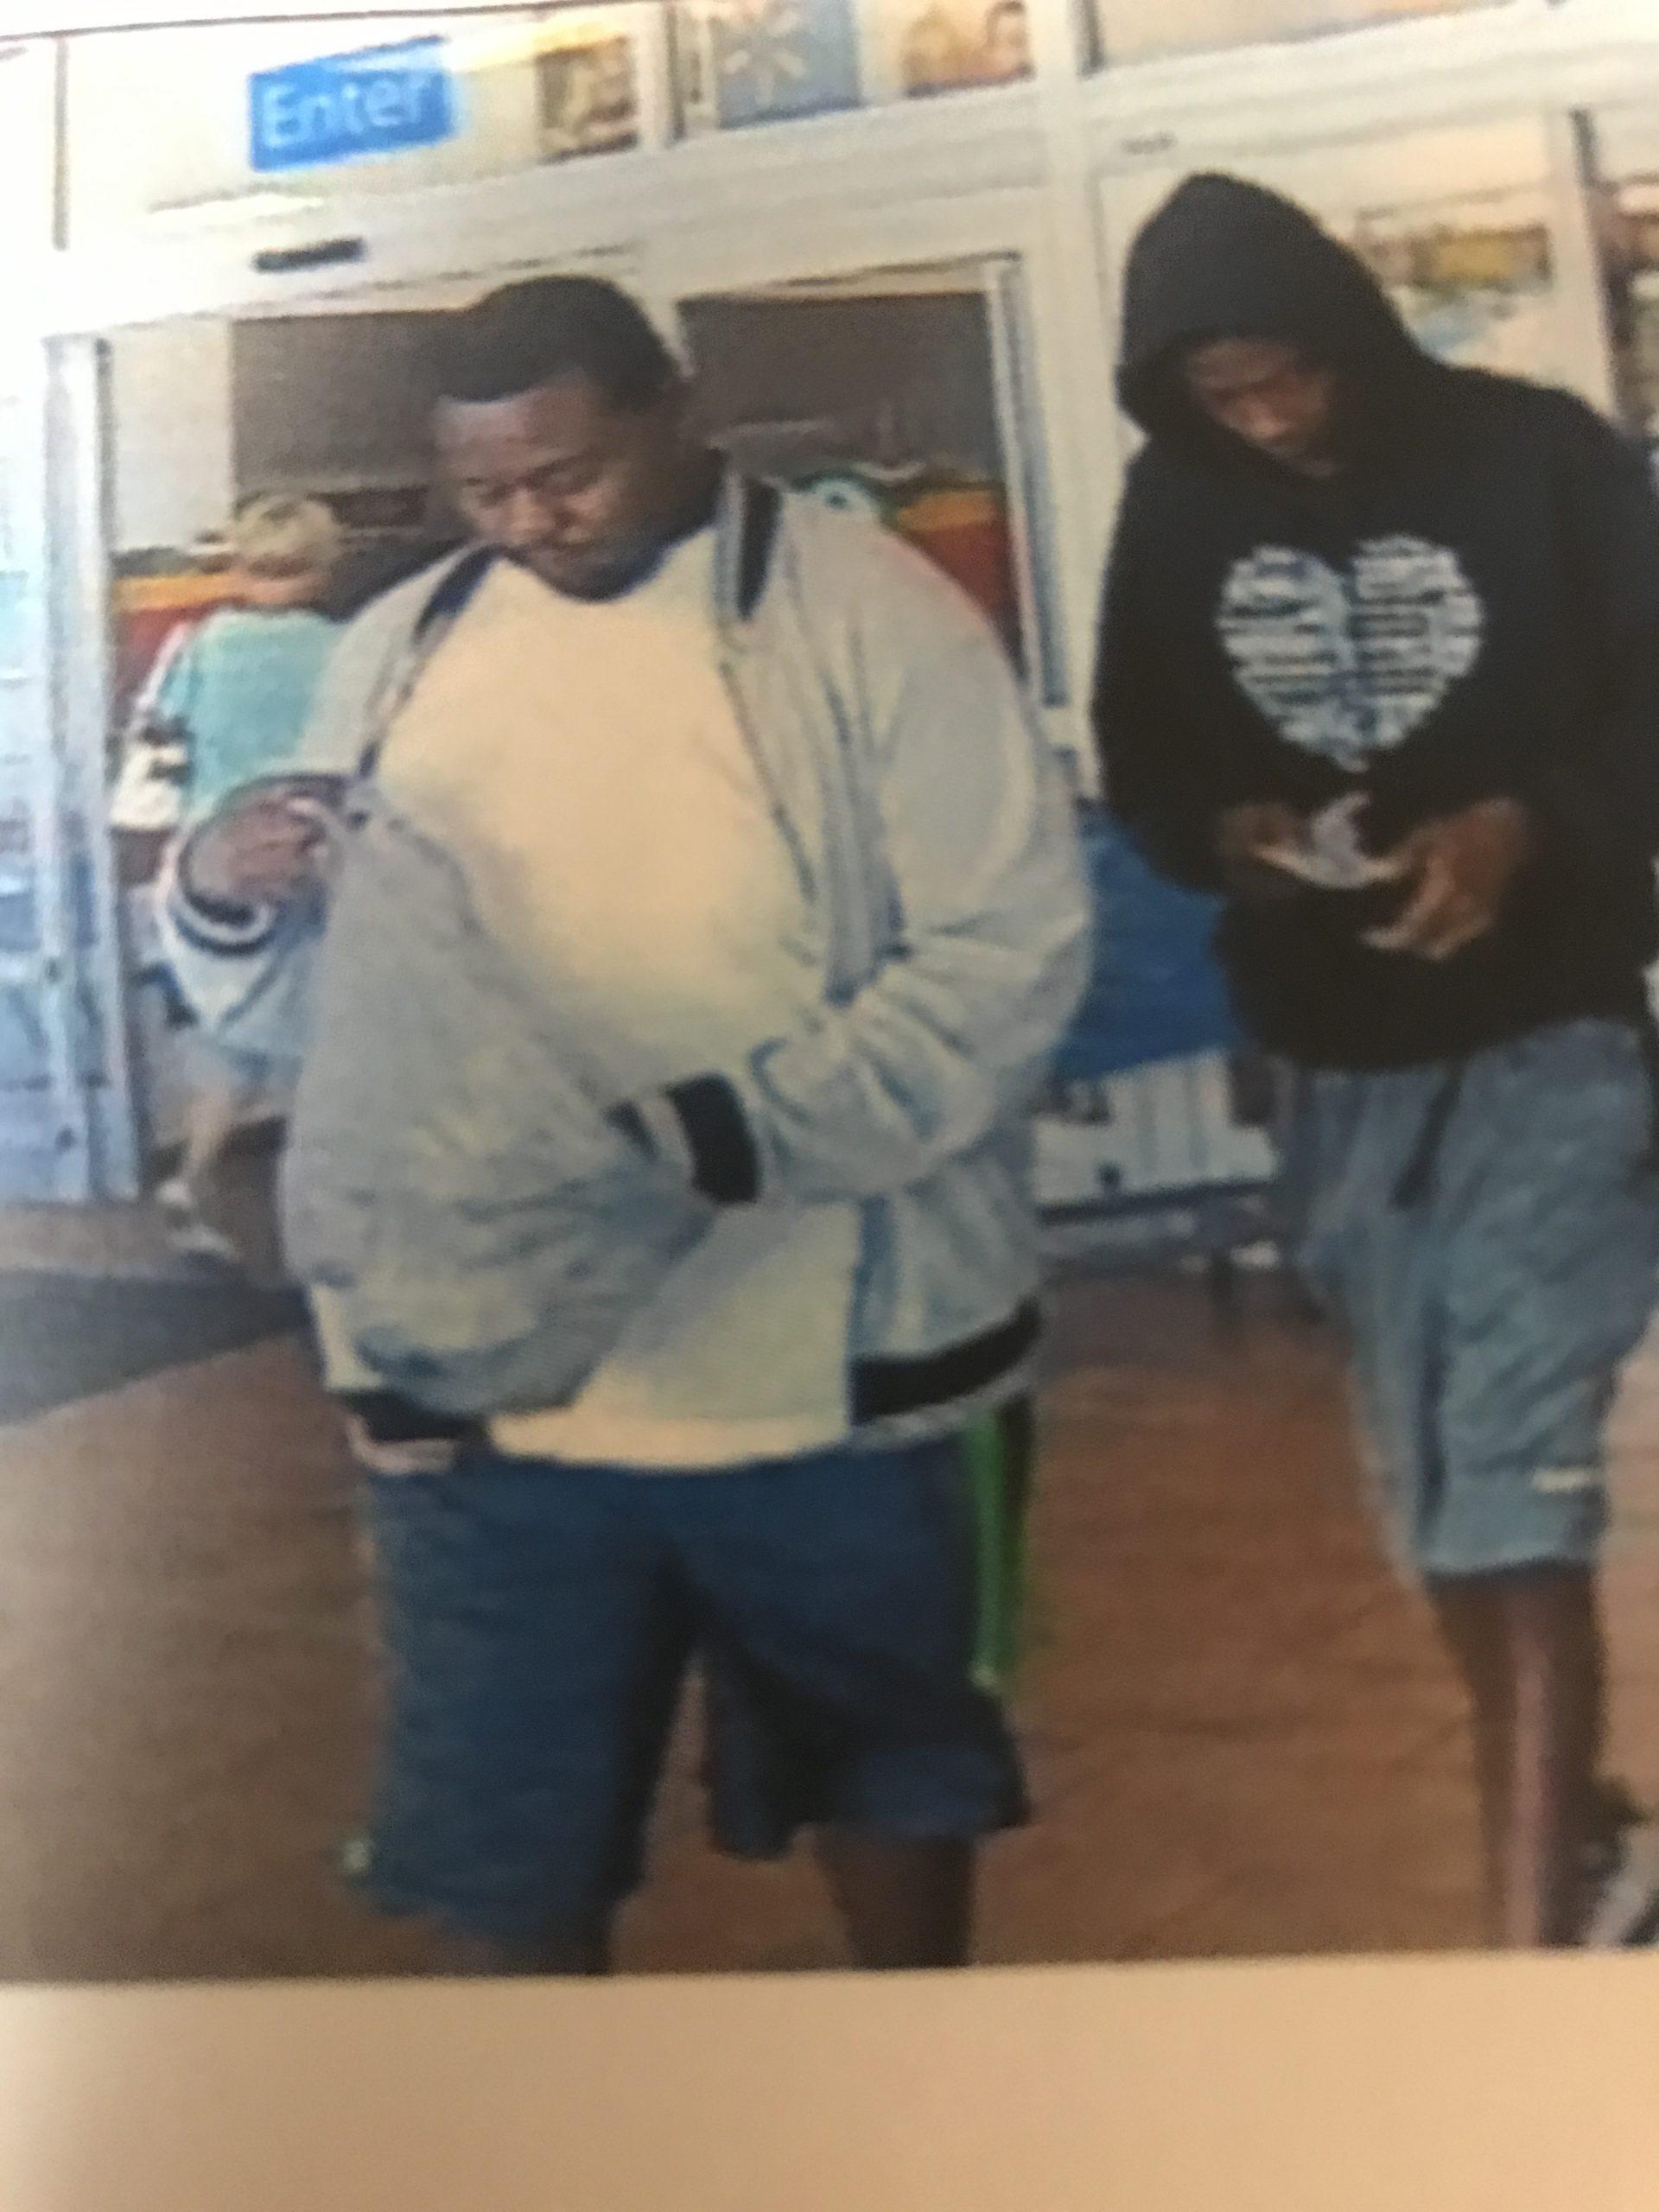 Mattoon Police/Coles County Crimestoppers Seeking Identity of Men in Regards to Vehicle Burglaries